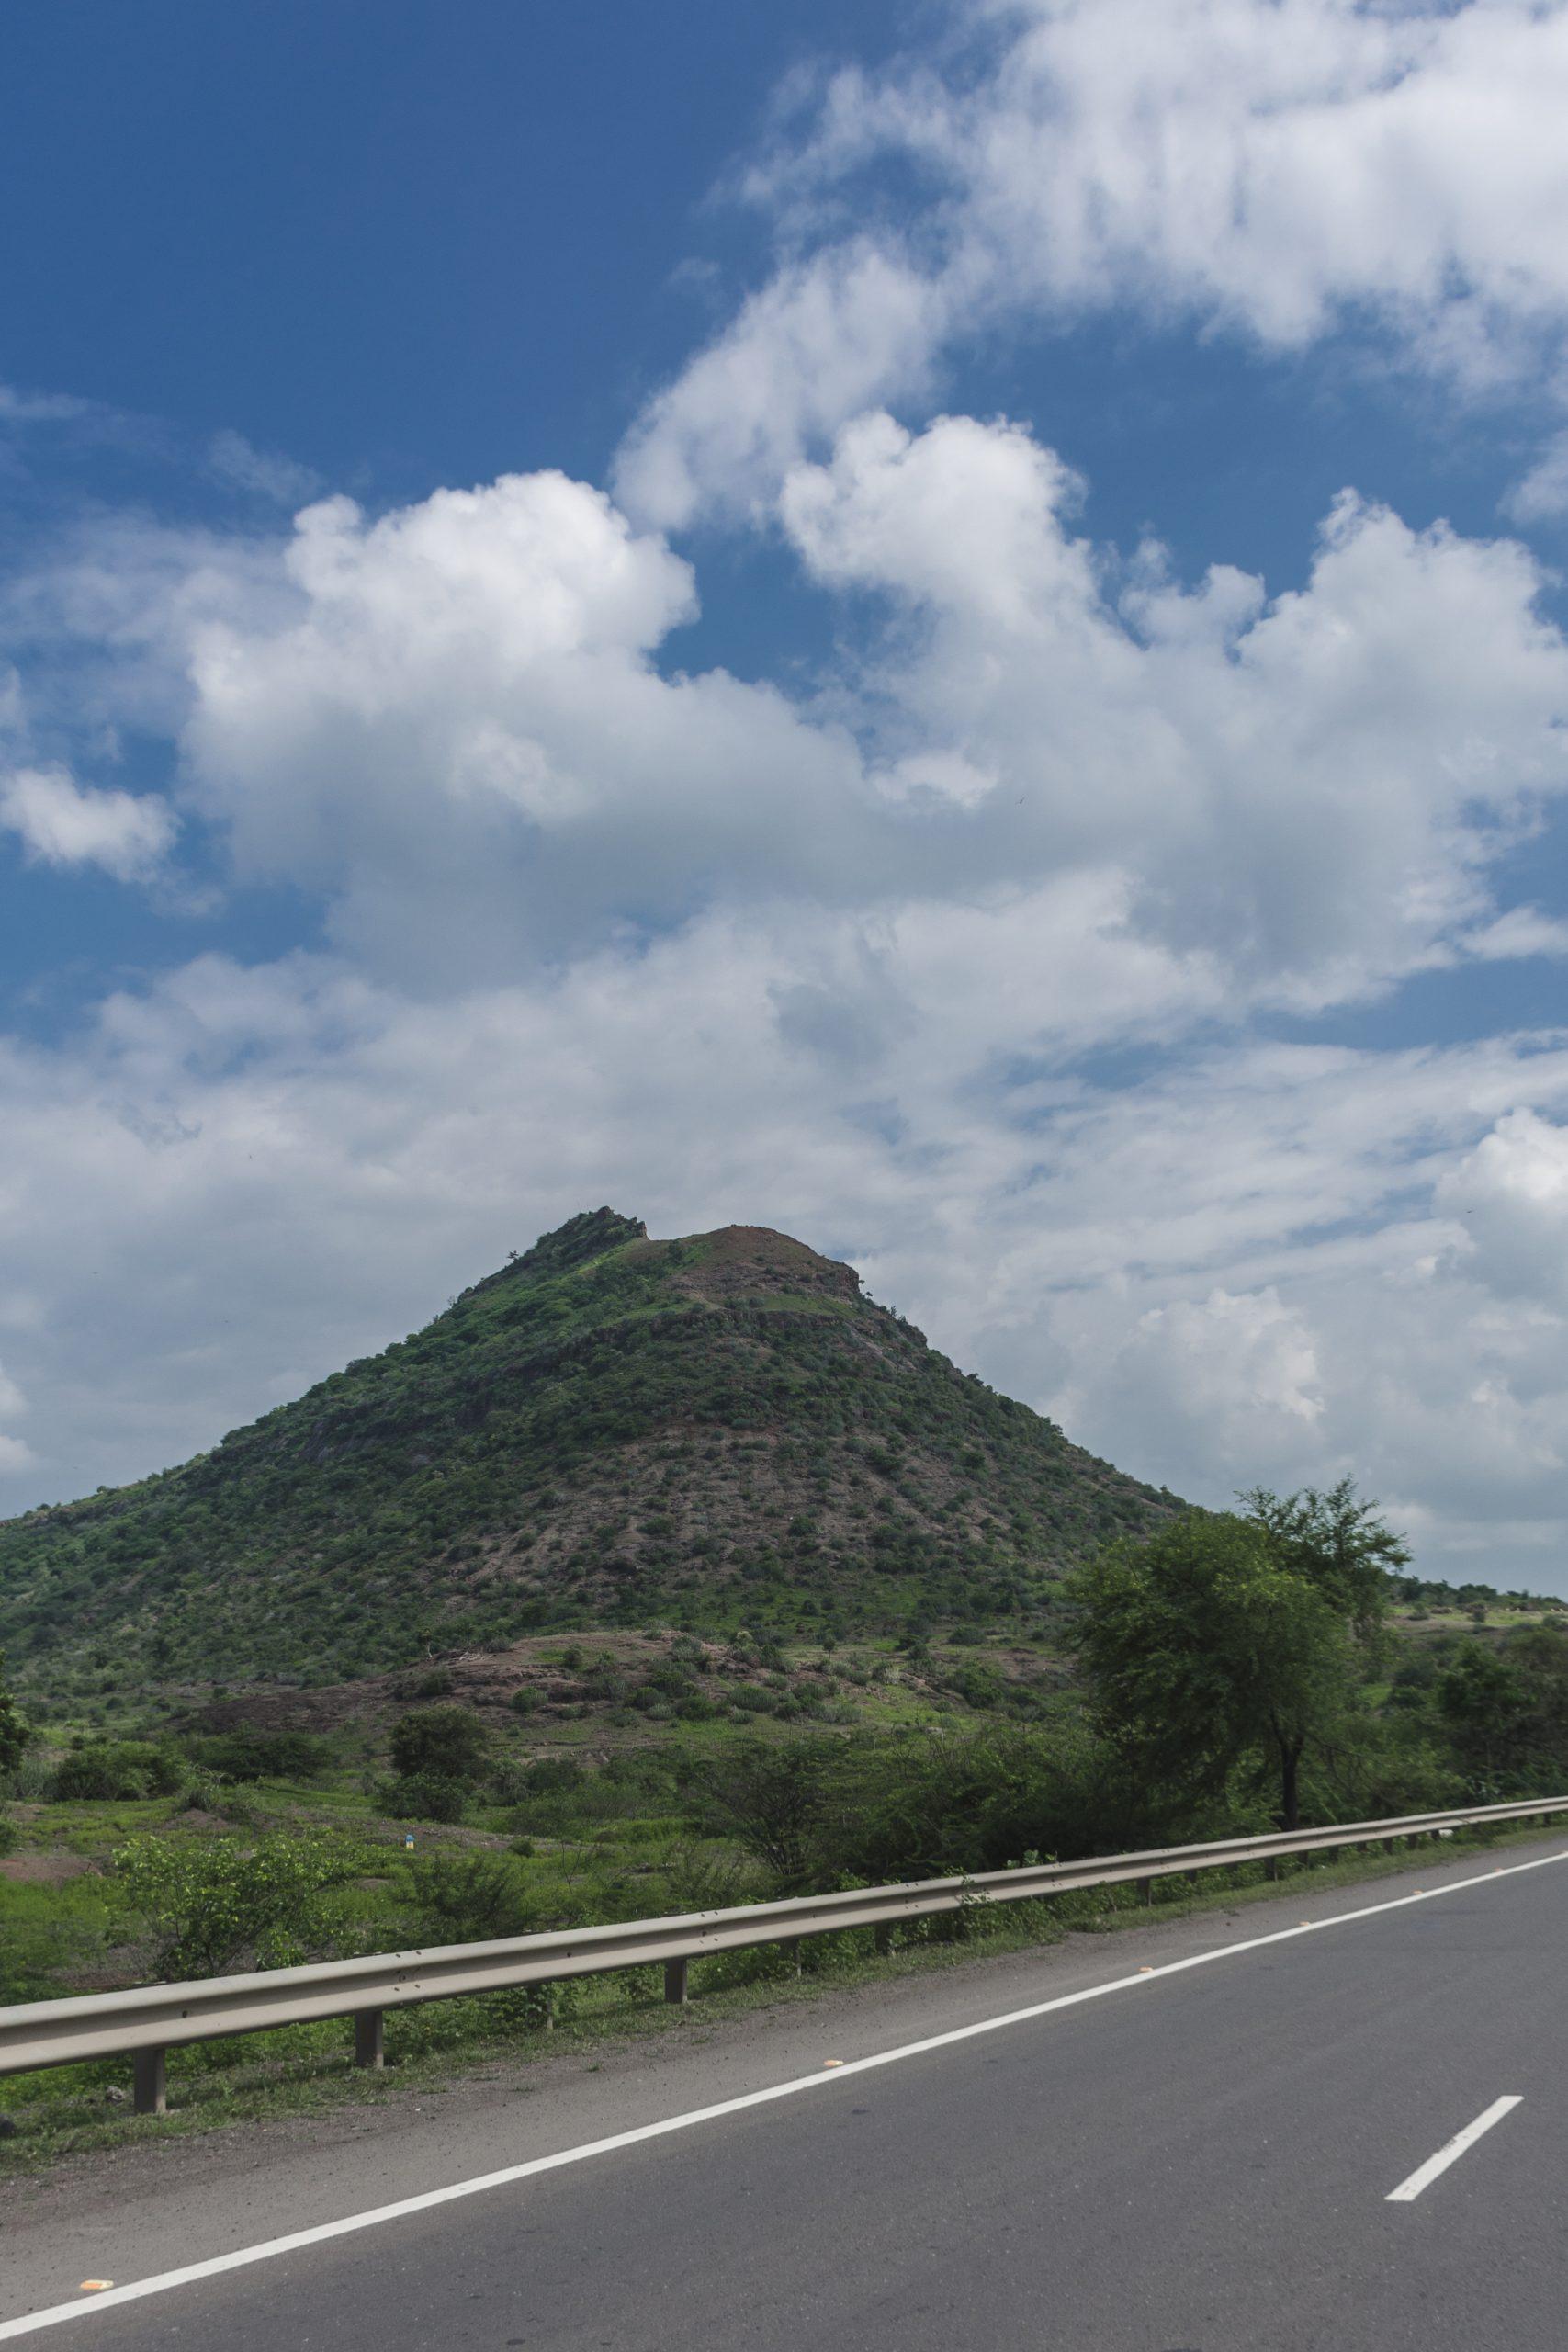 road along mountains